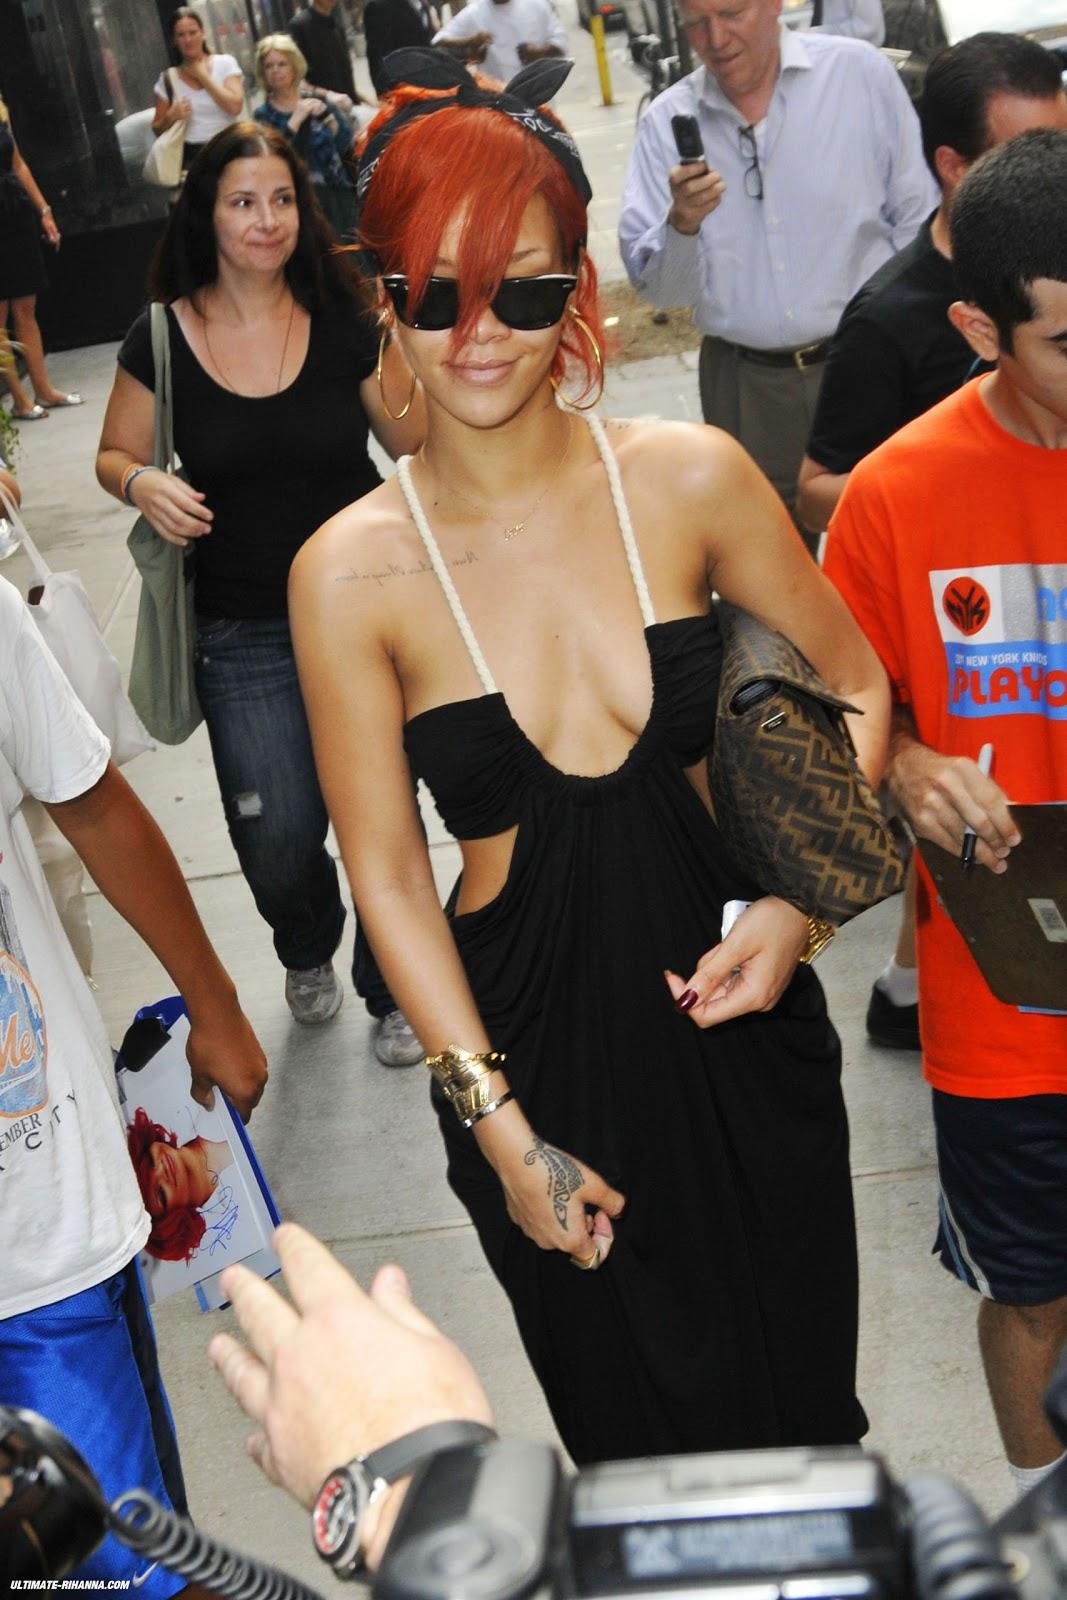 http://4.bp.blogspot.com/-UfUMjIm80Oc/Tim-18IZDzI/AAAAAAAABbM/fBe_xP4AvDo/s1600/RihannaF1.jpg